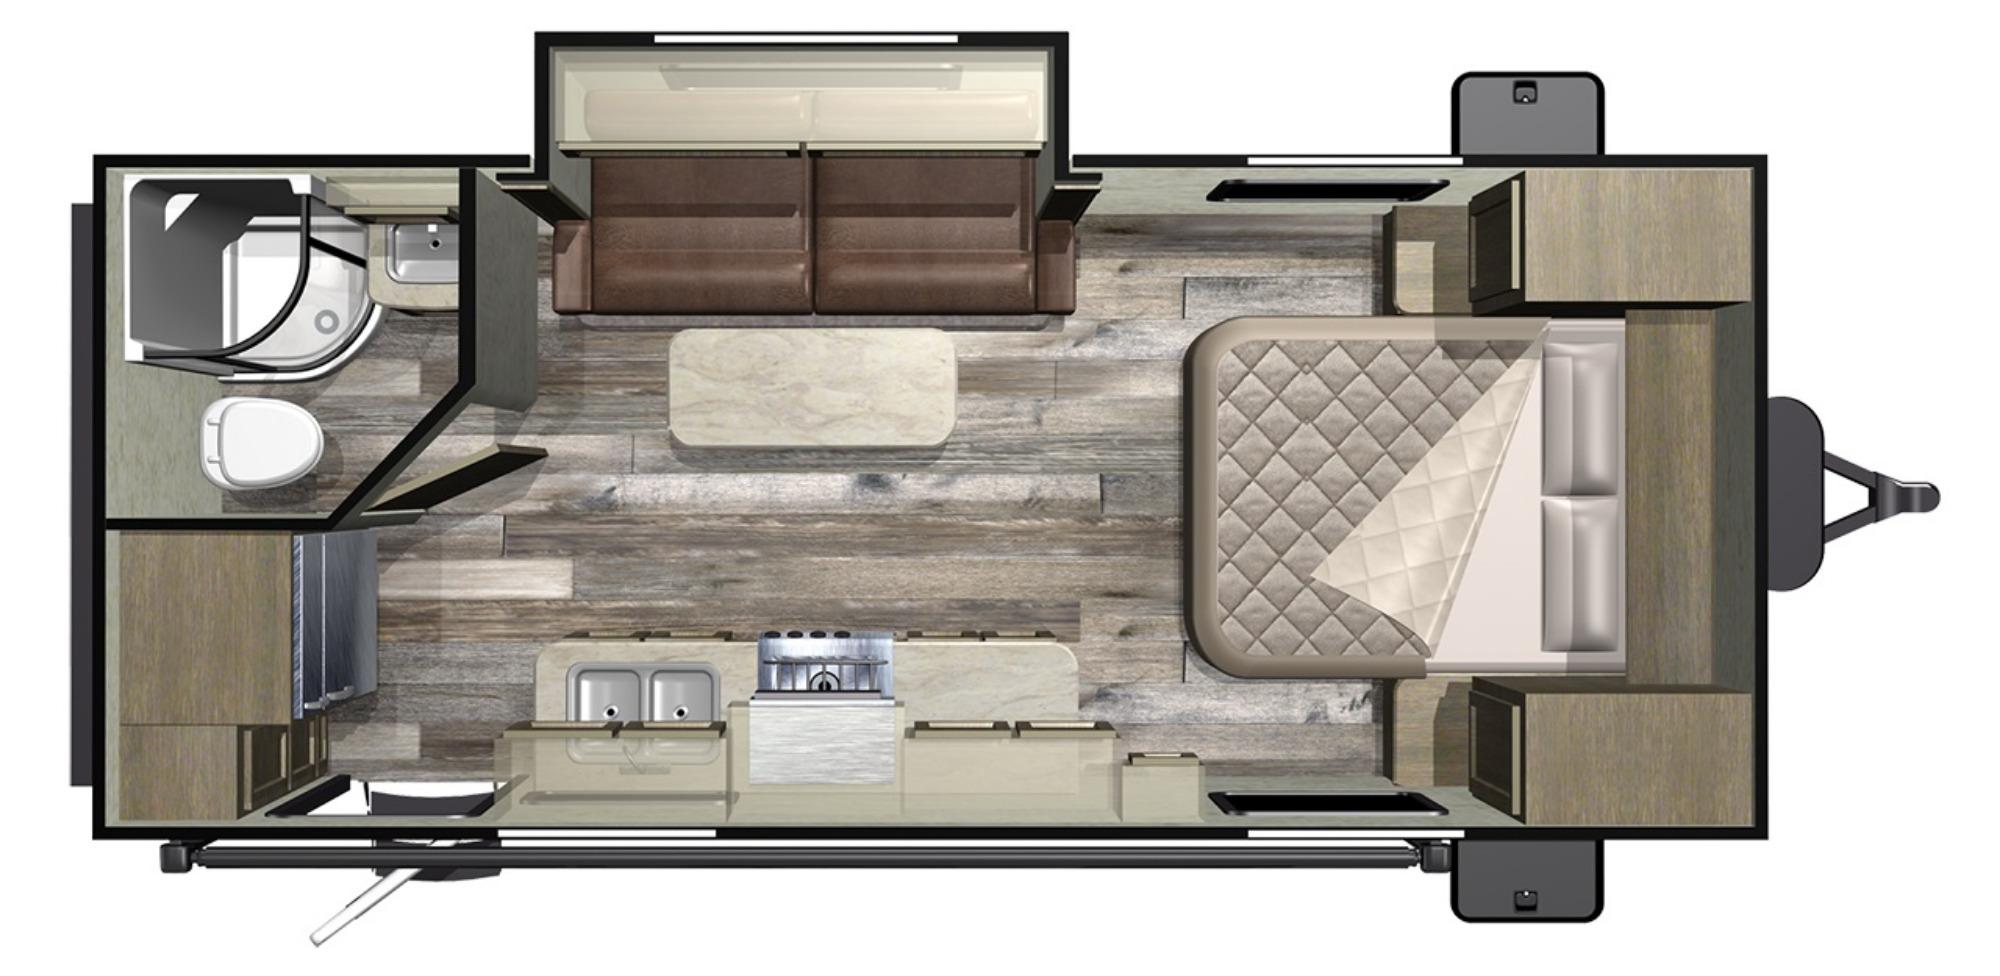 View Floor Plan for 2020 STARCRAFT MOSSY OAK 20FBS